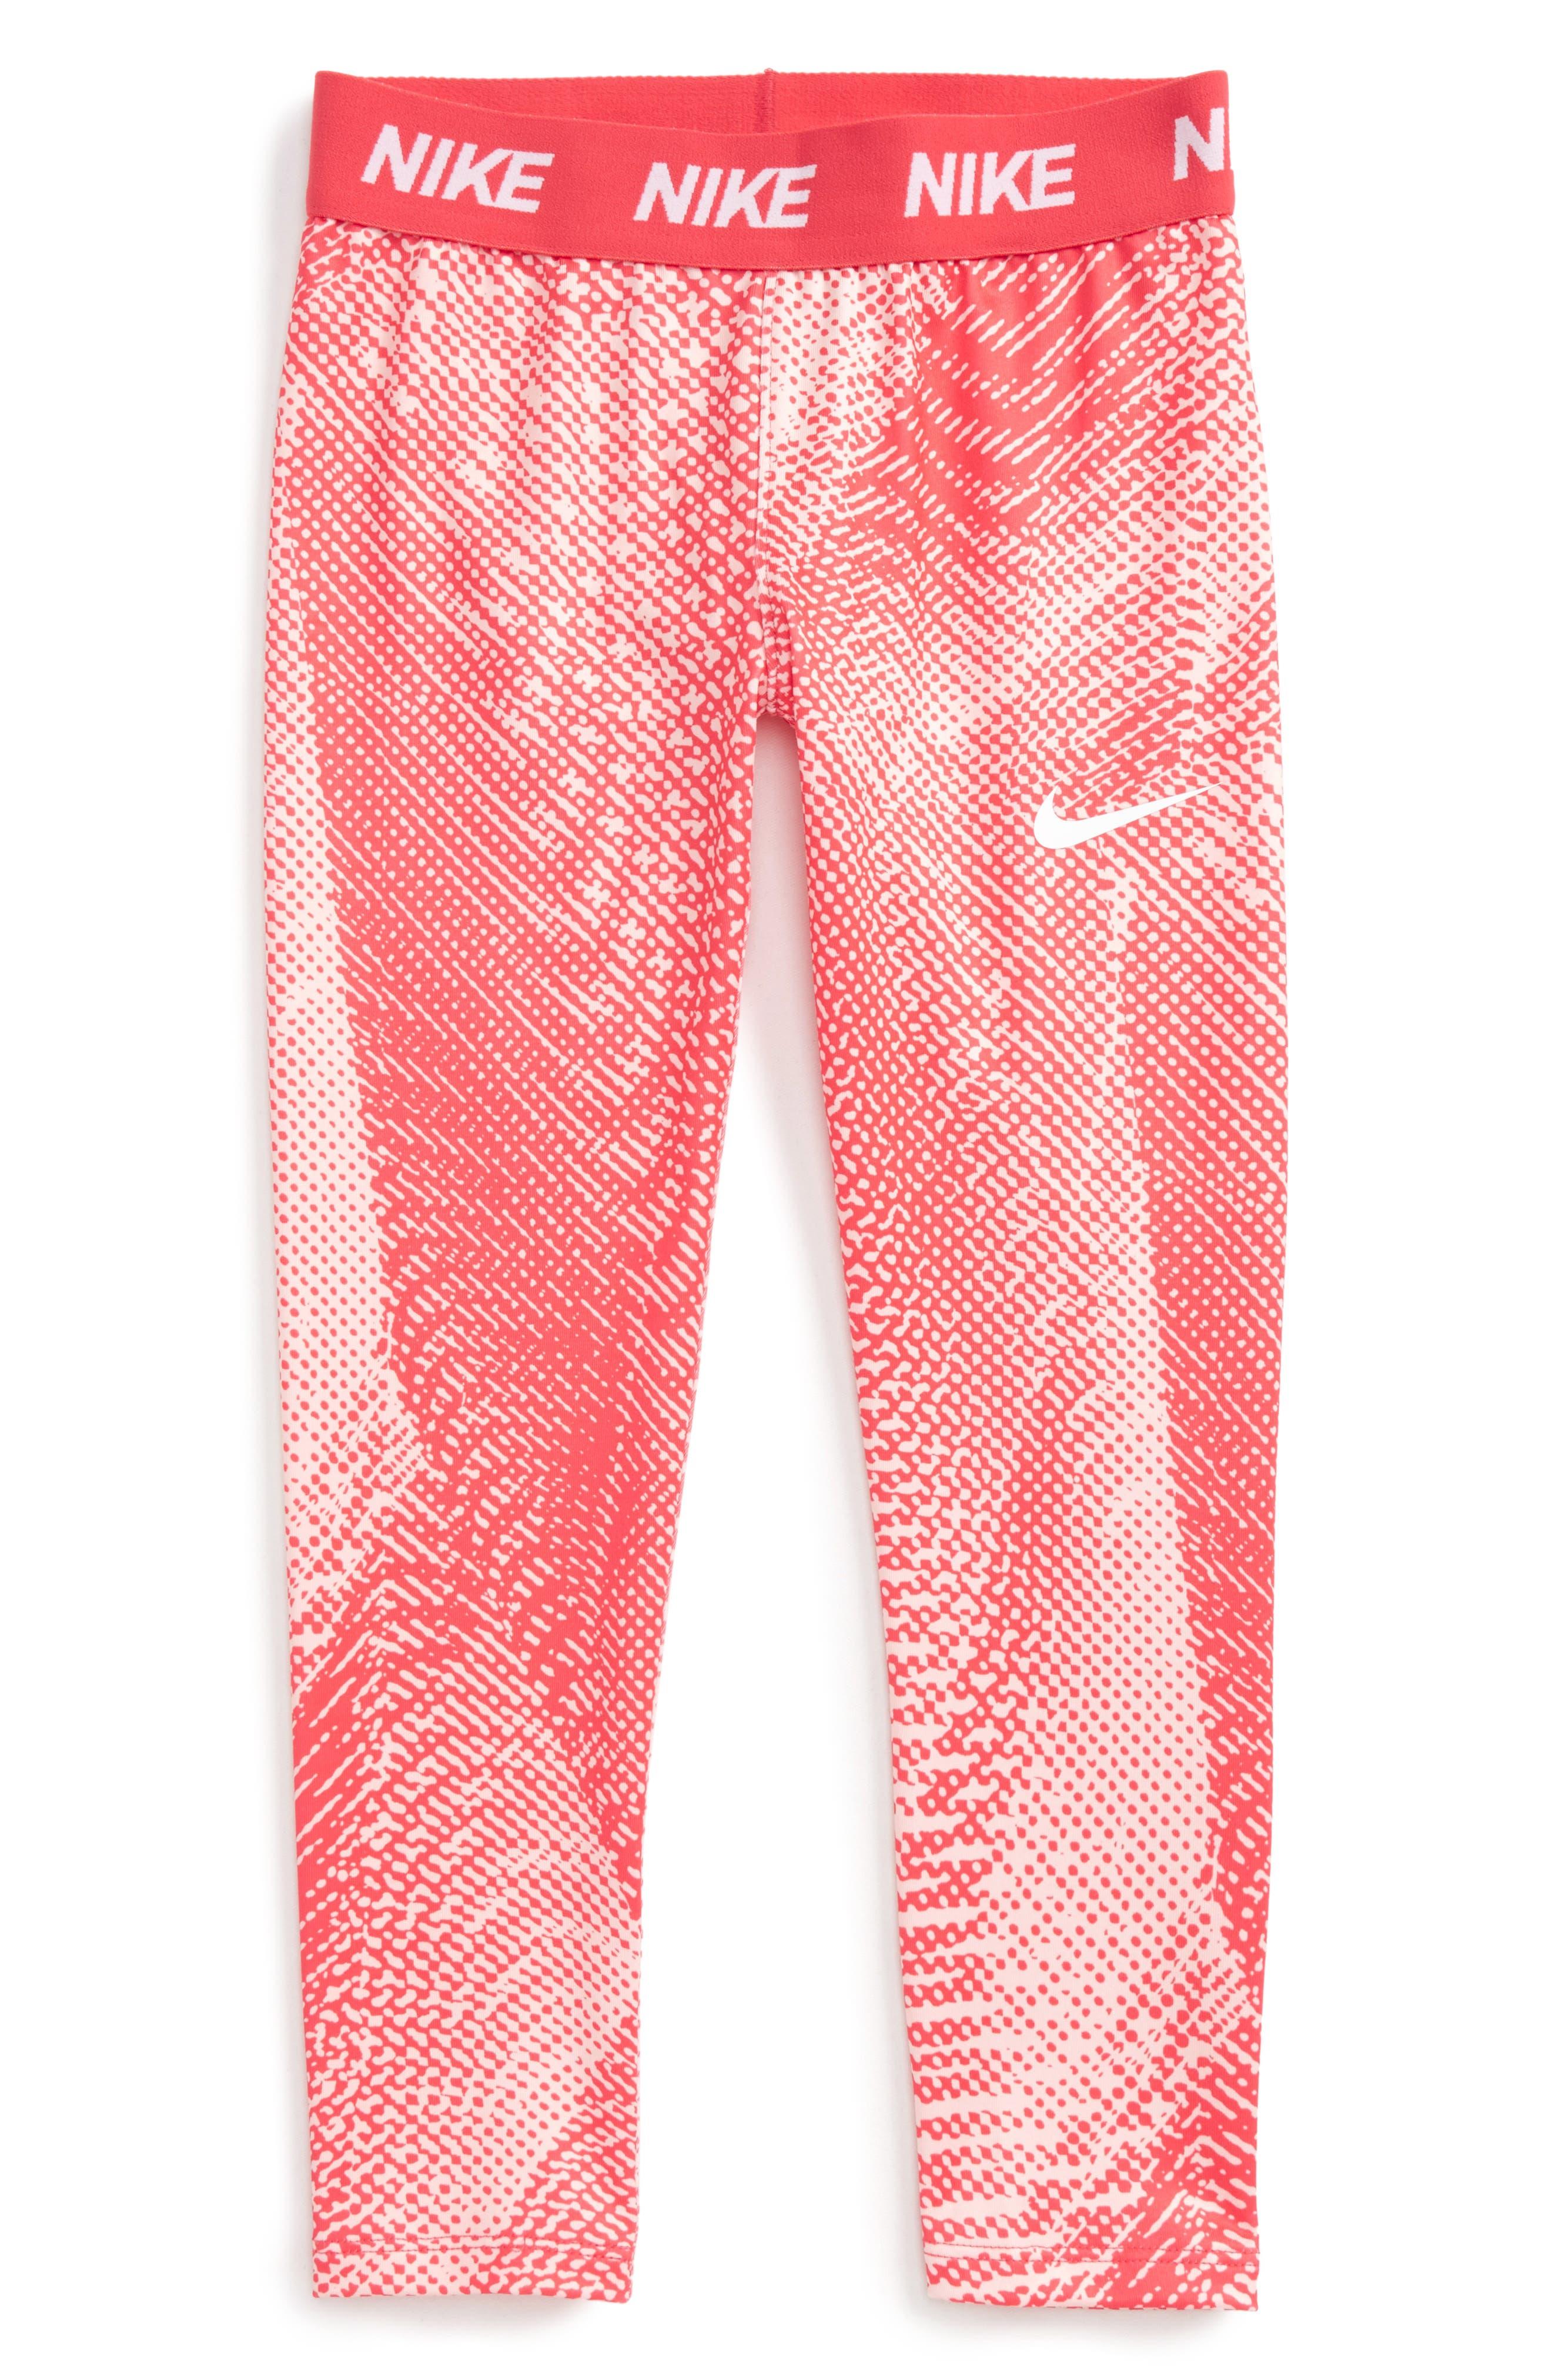 Dri-FIT Leggings,                         Main,                         color, Fusion Red